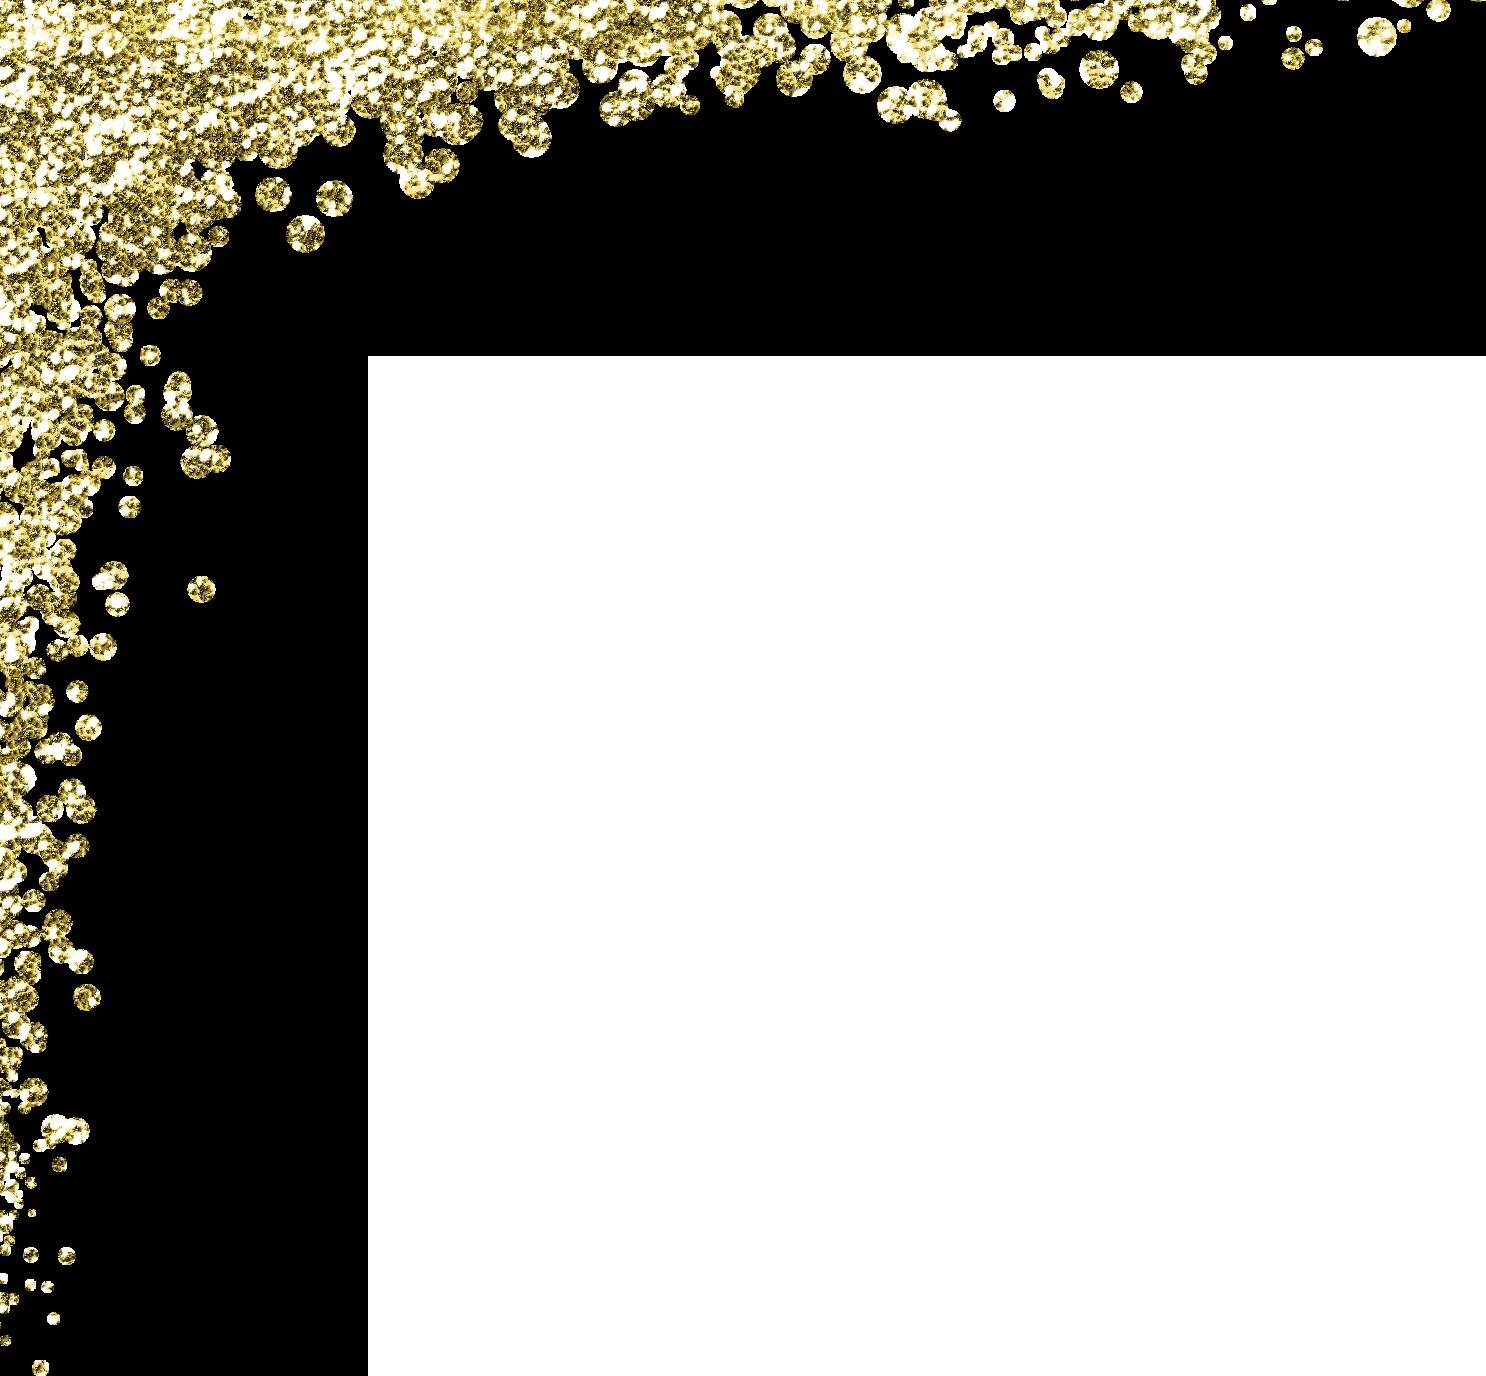 Gold glitter border png. Https www live dancing